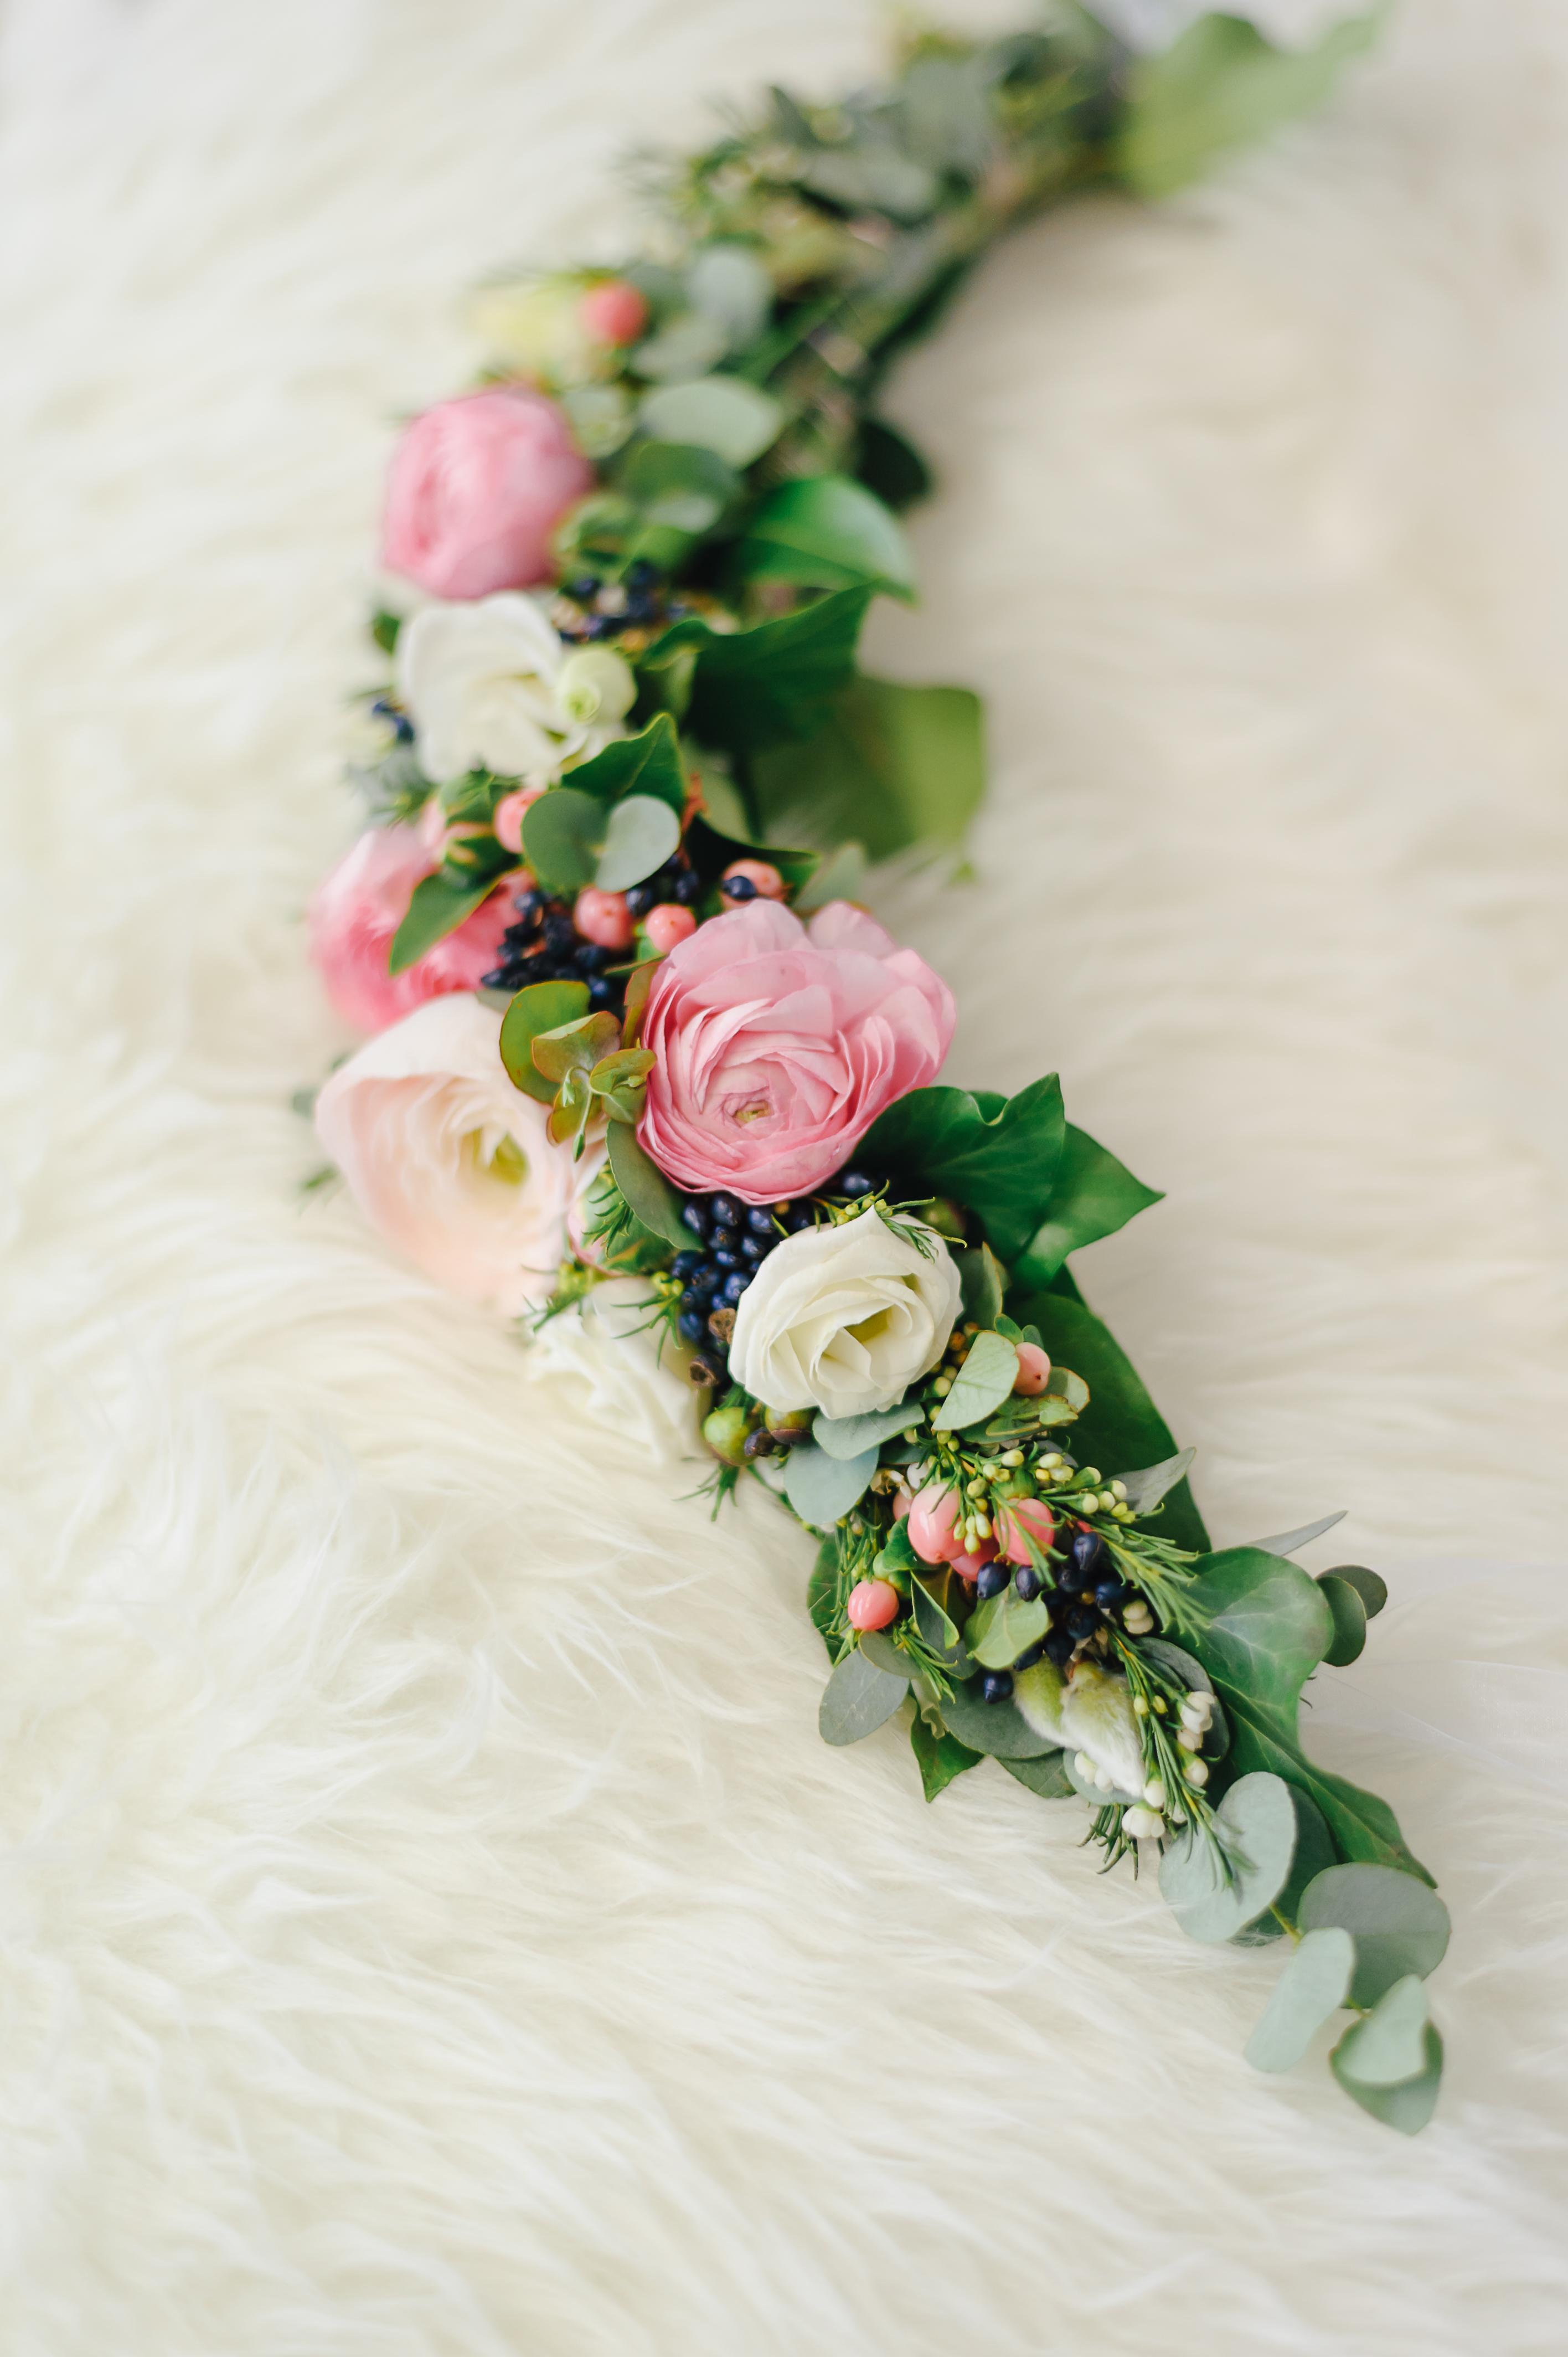 zarte Farben & Blüten